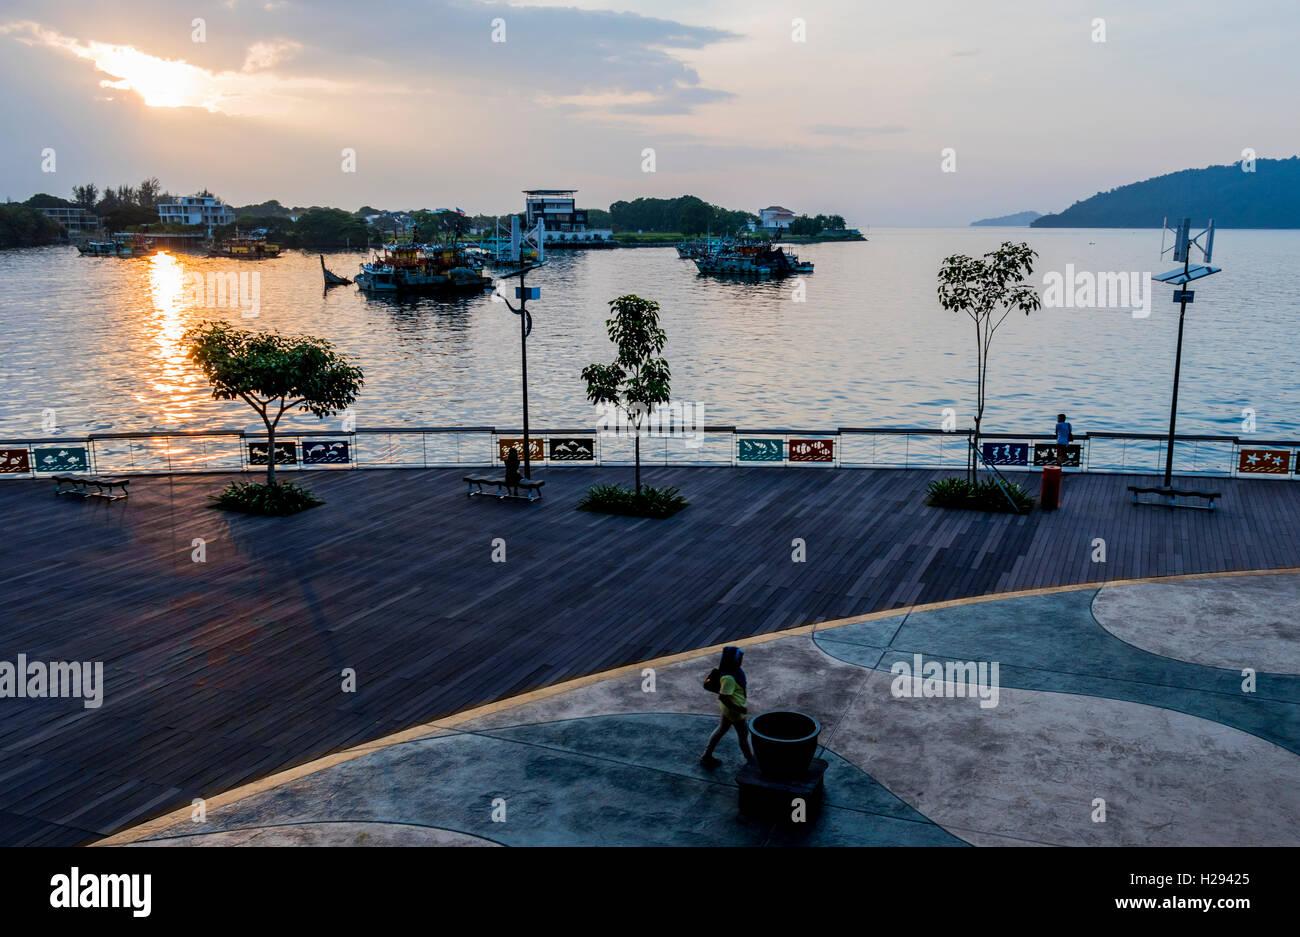 Boats in the South China Sea seen from Kota Kinabalu Sabah Malaysia Borneo - Stock Image